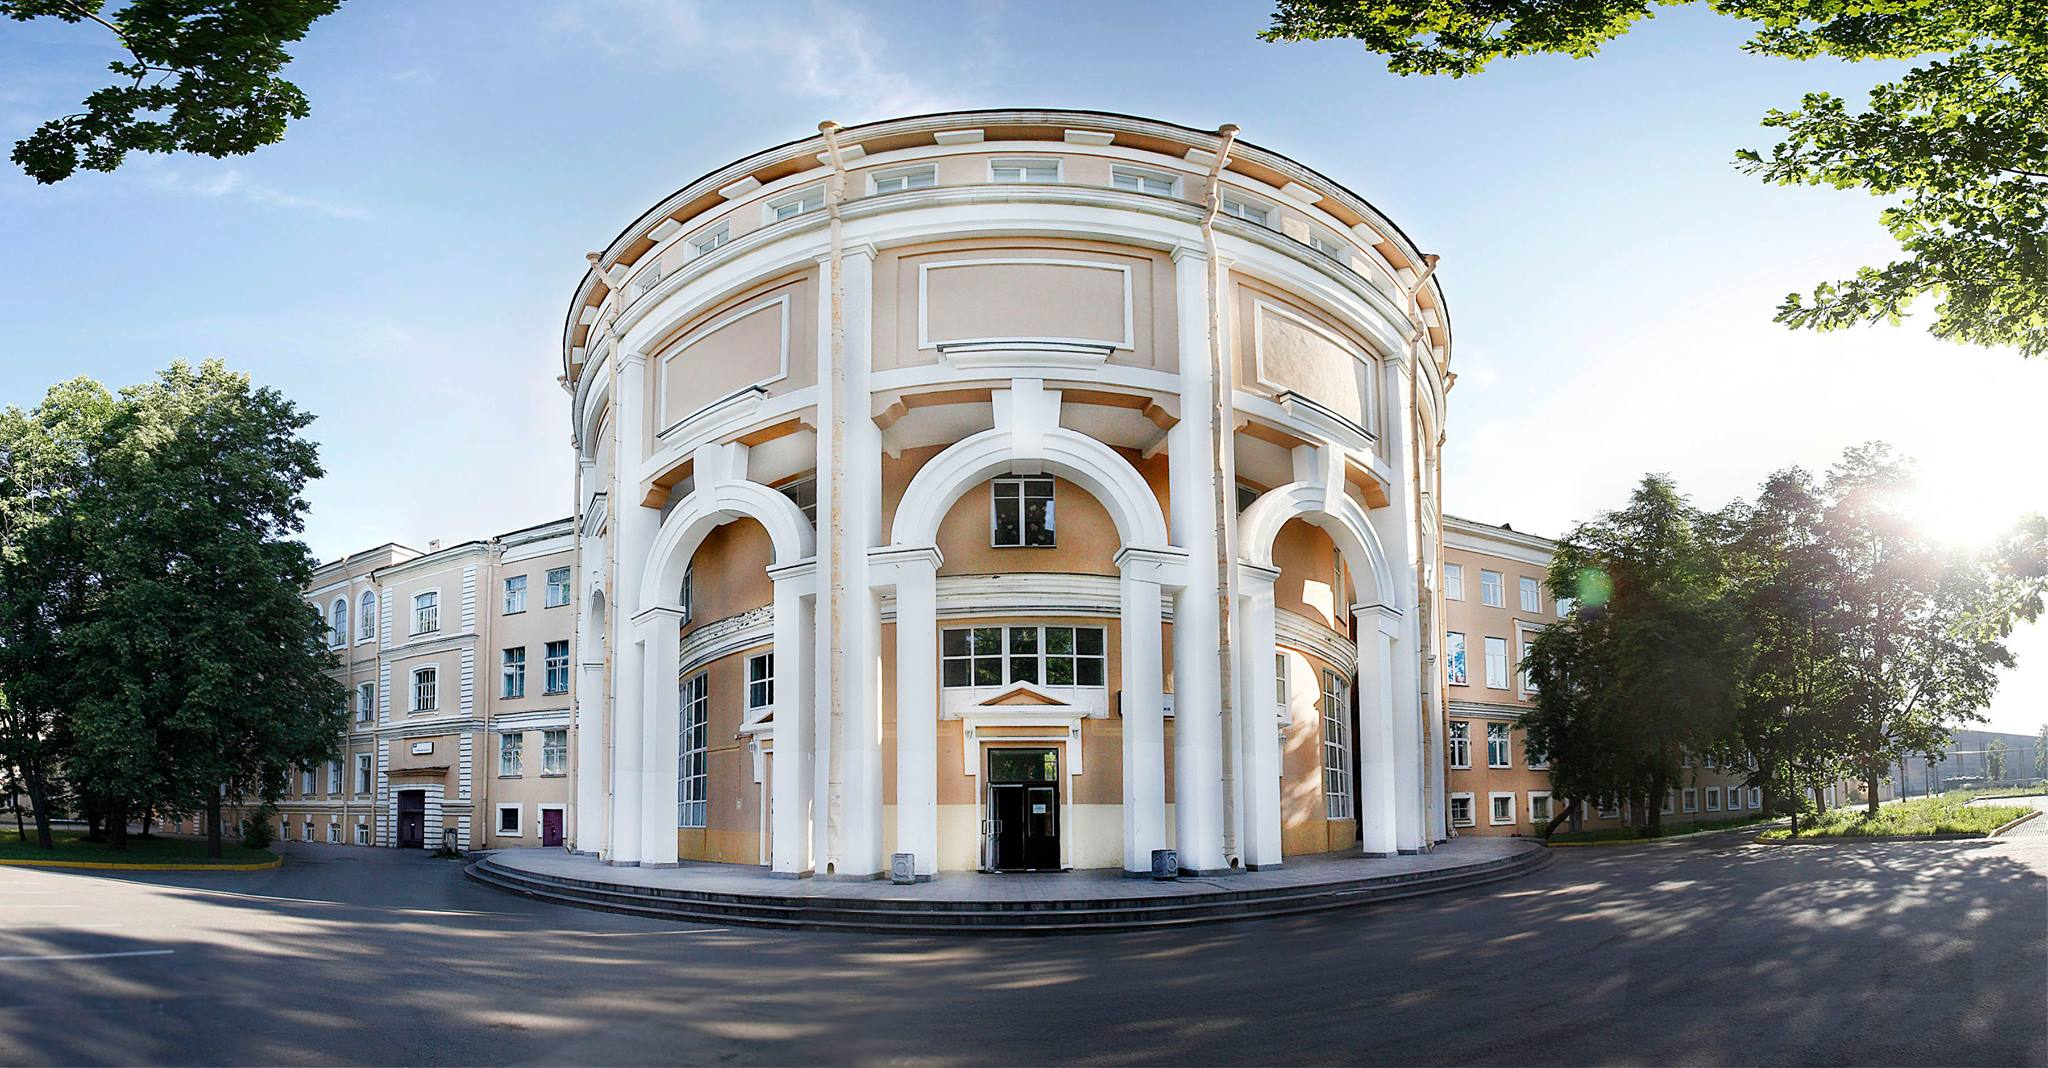 First Pavlov State Medical University of St. Petersburg Campus